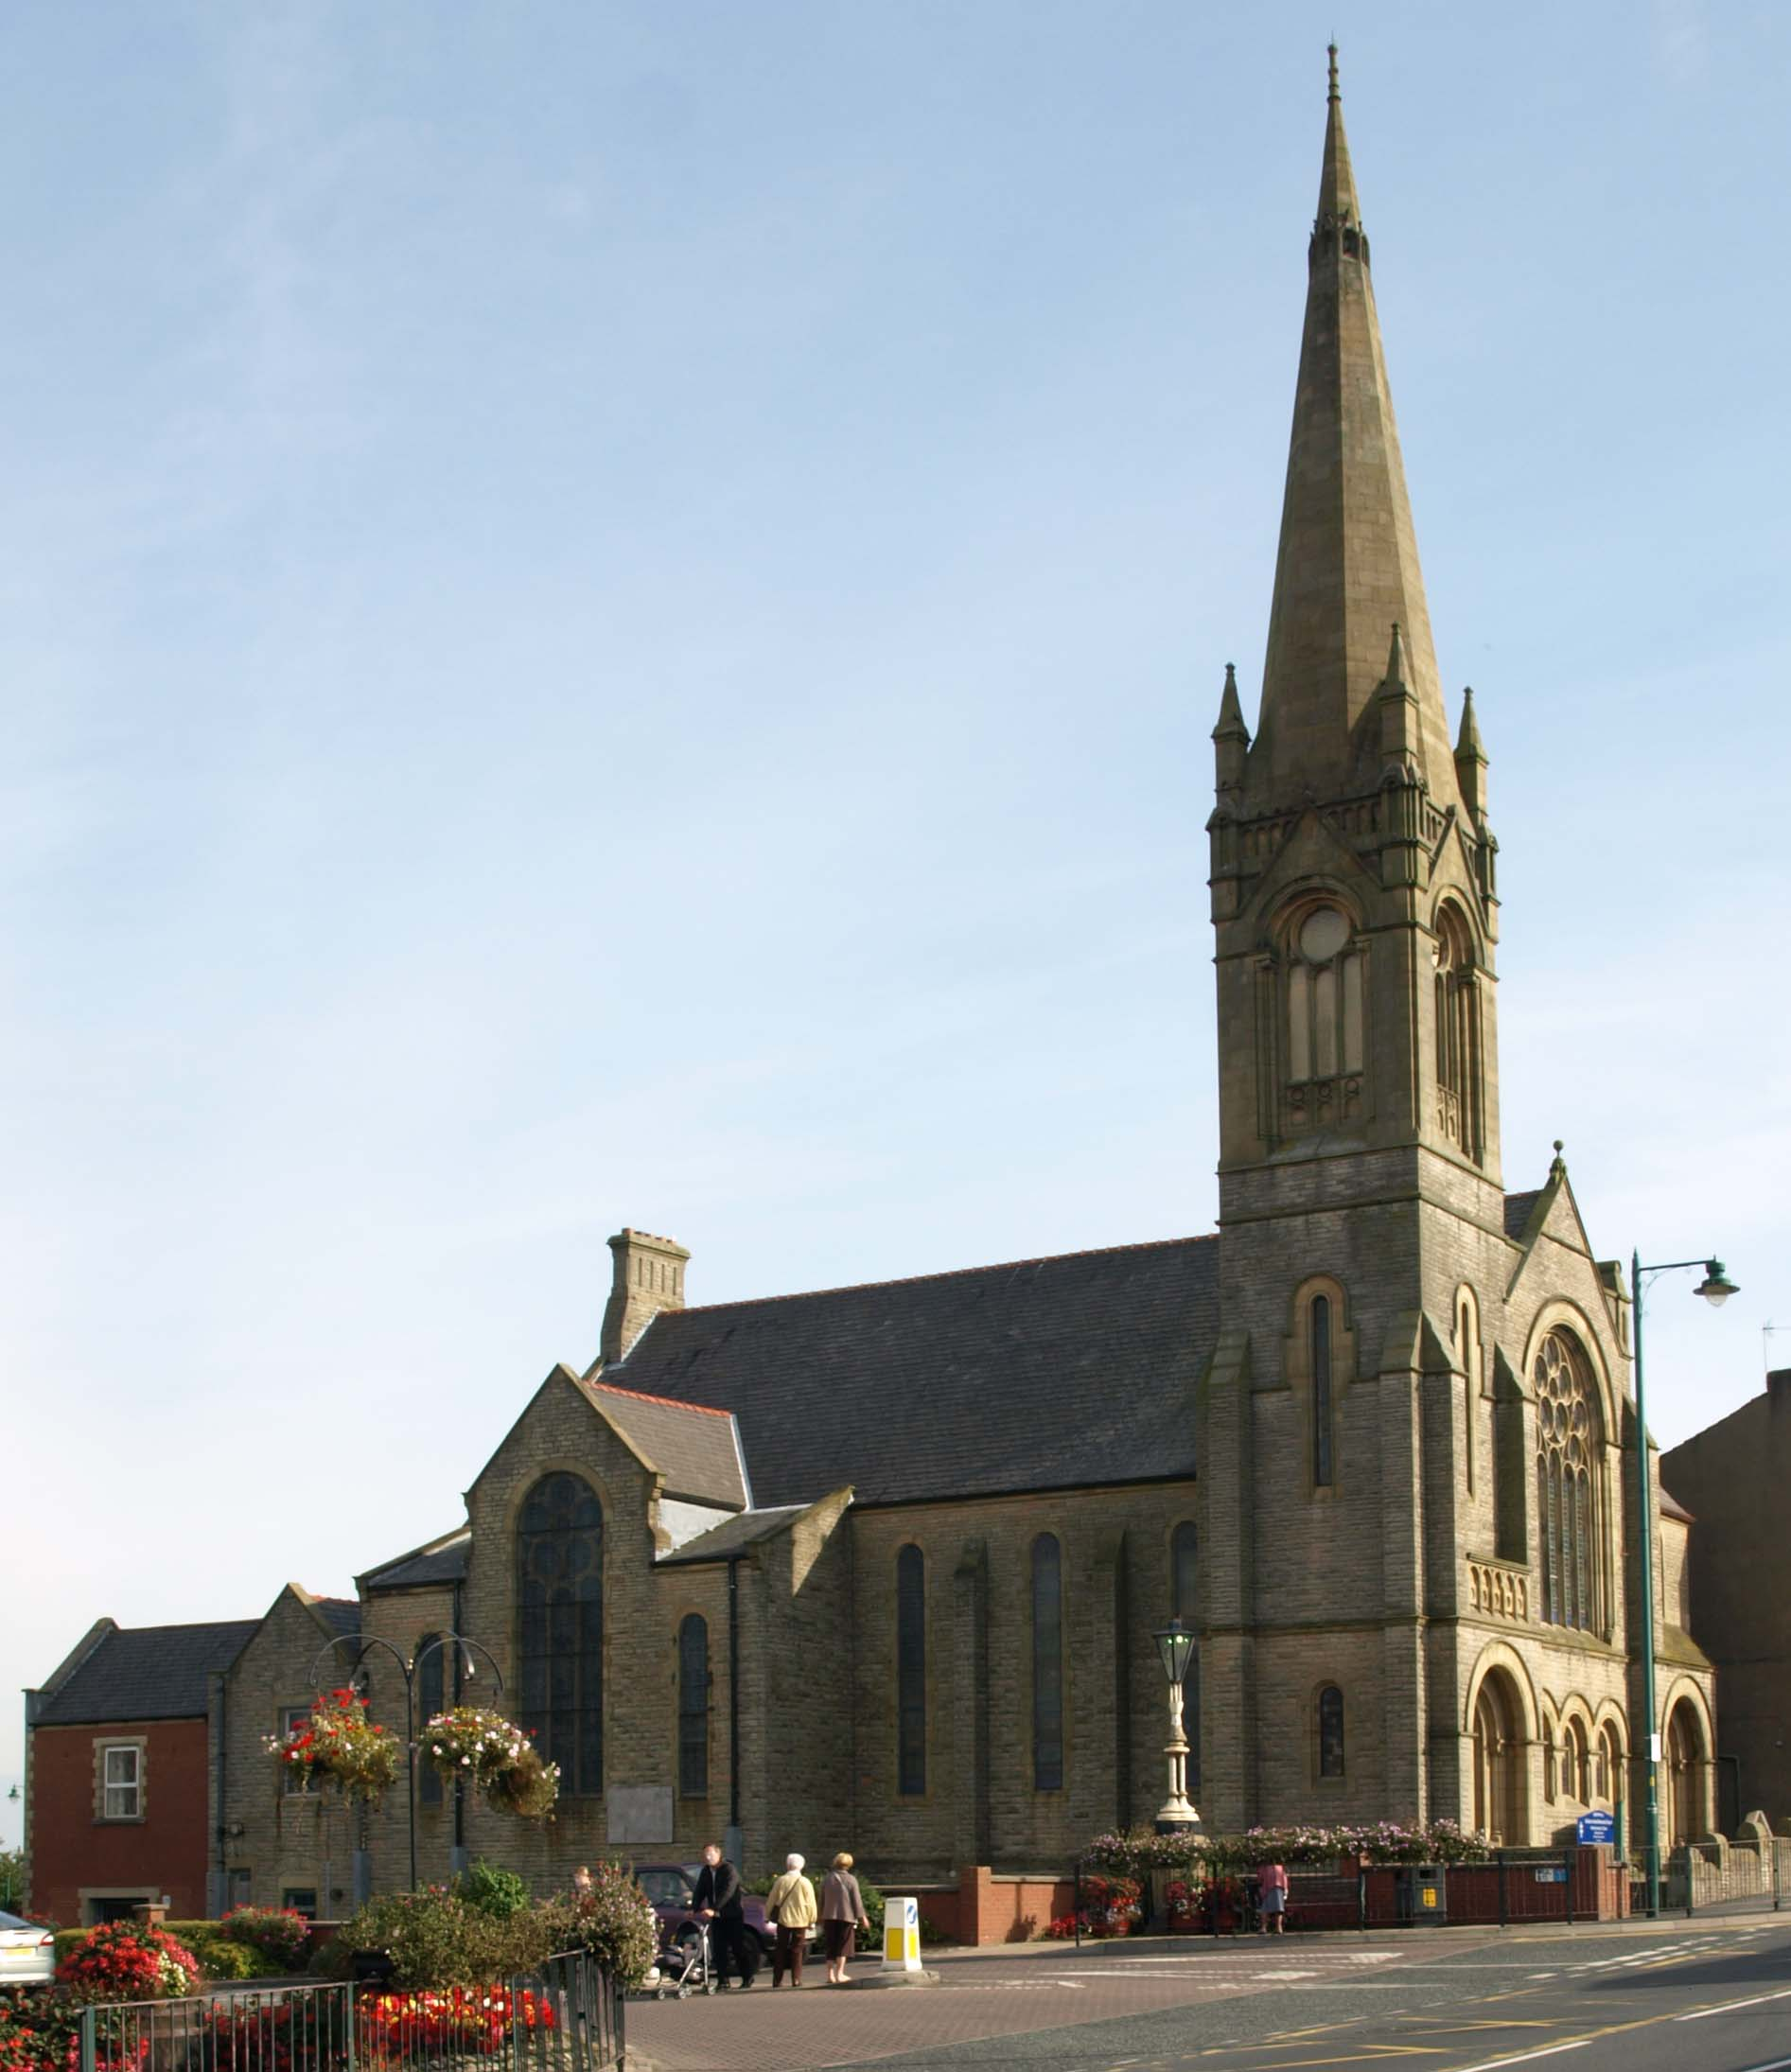 The Church in Poulton Street